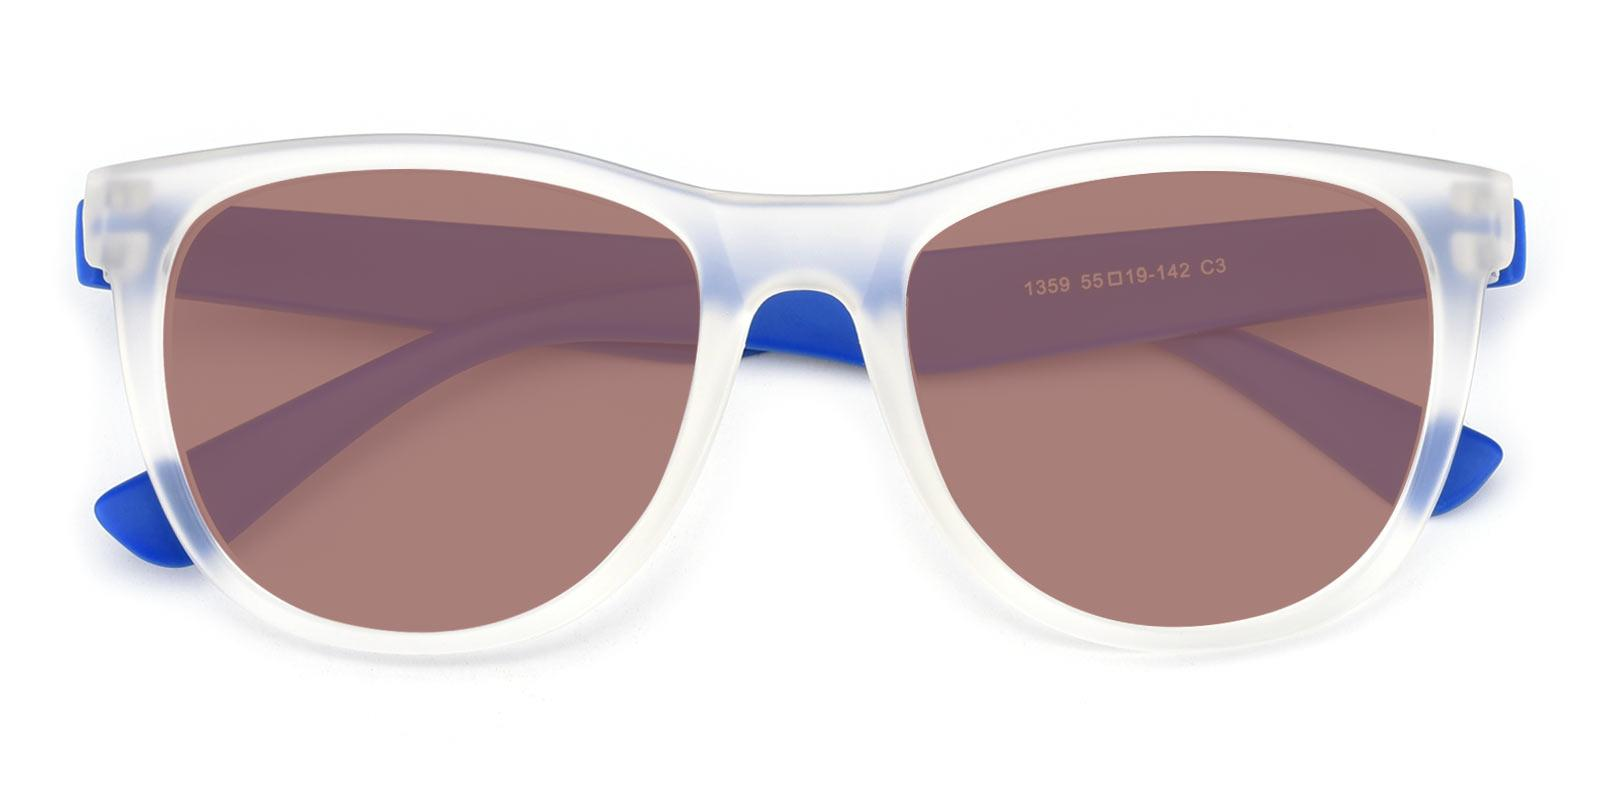 Malibu-Translucent-Cat-TR-Sunglasses-detail